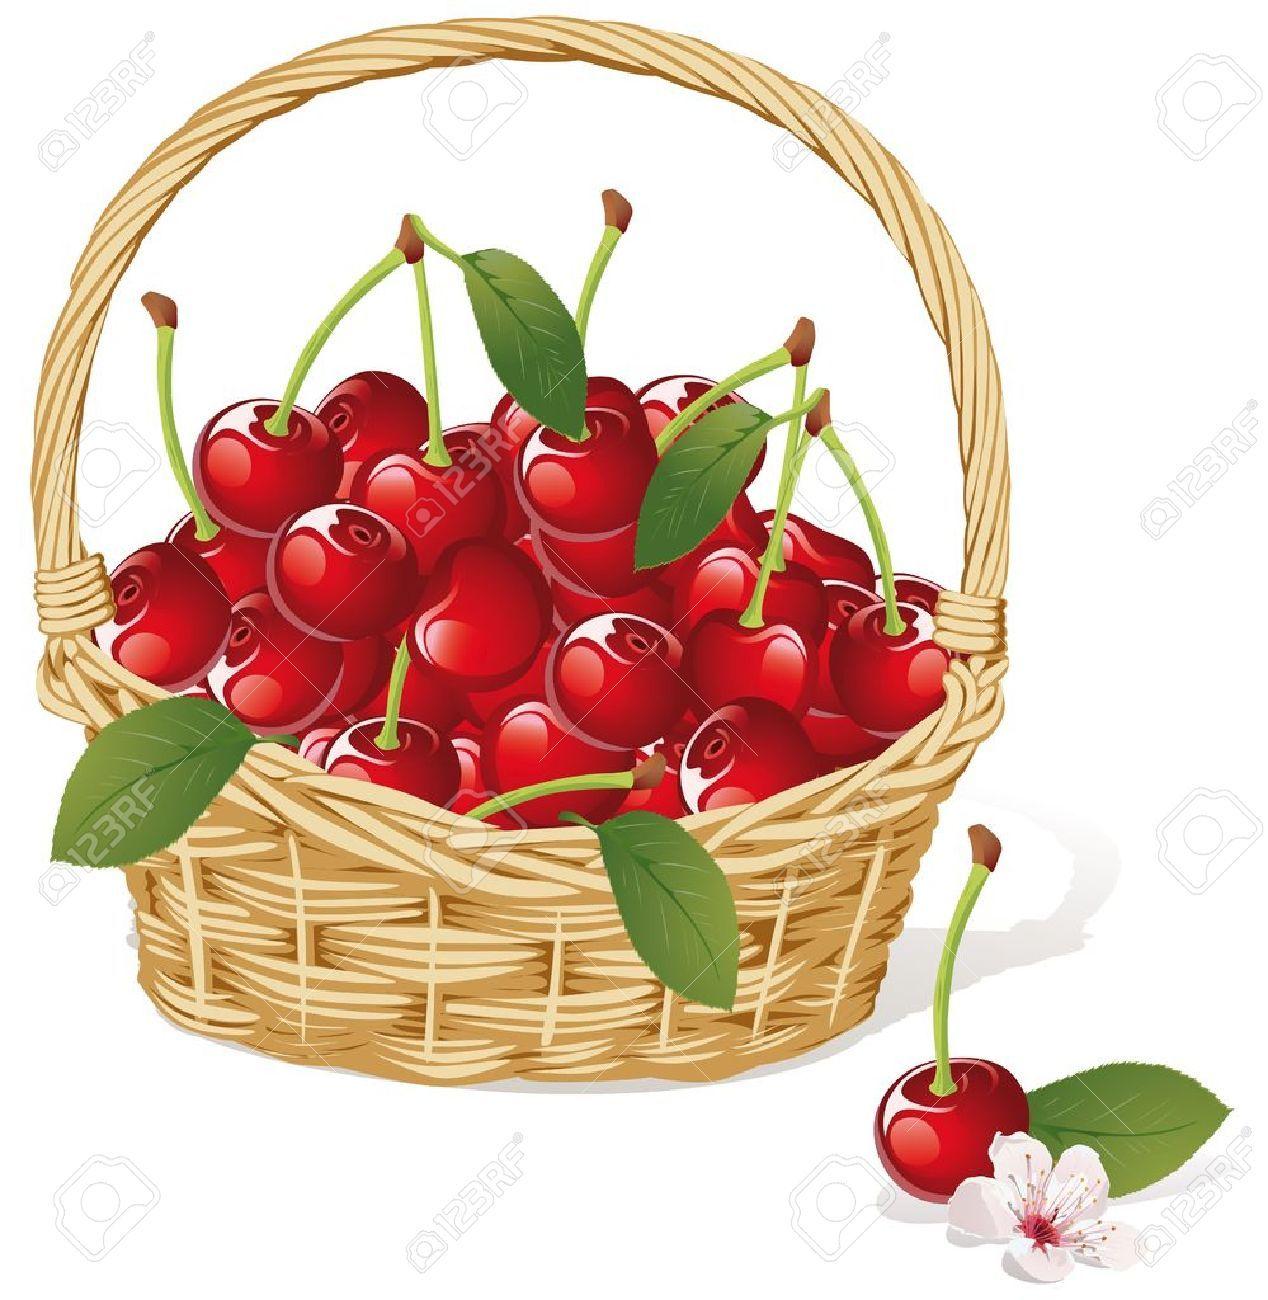 Cherry basket royalty free. Cherries clipart vector